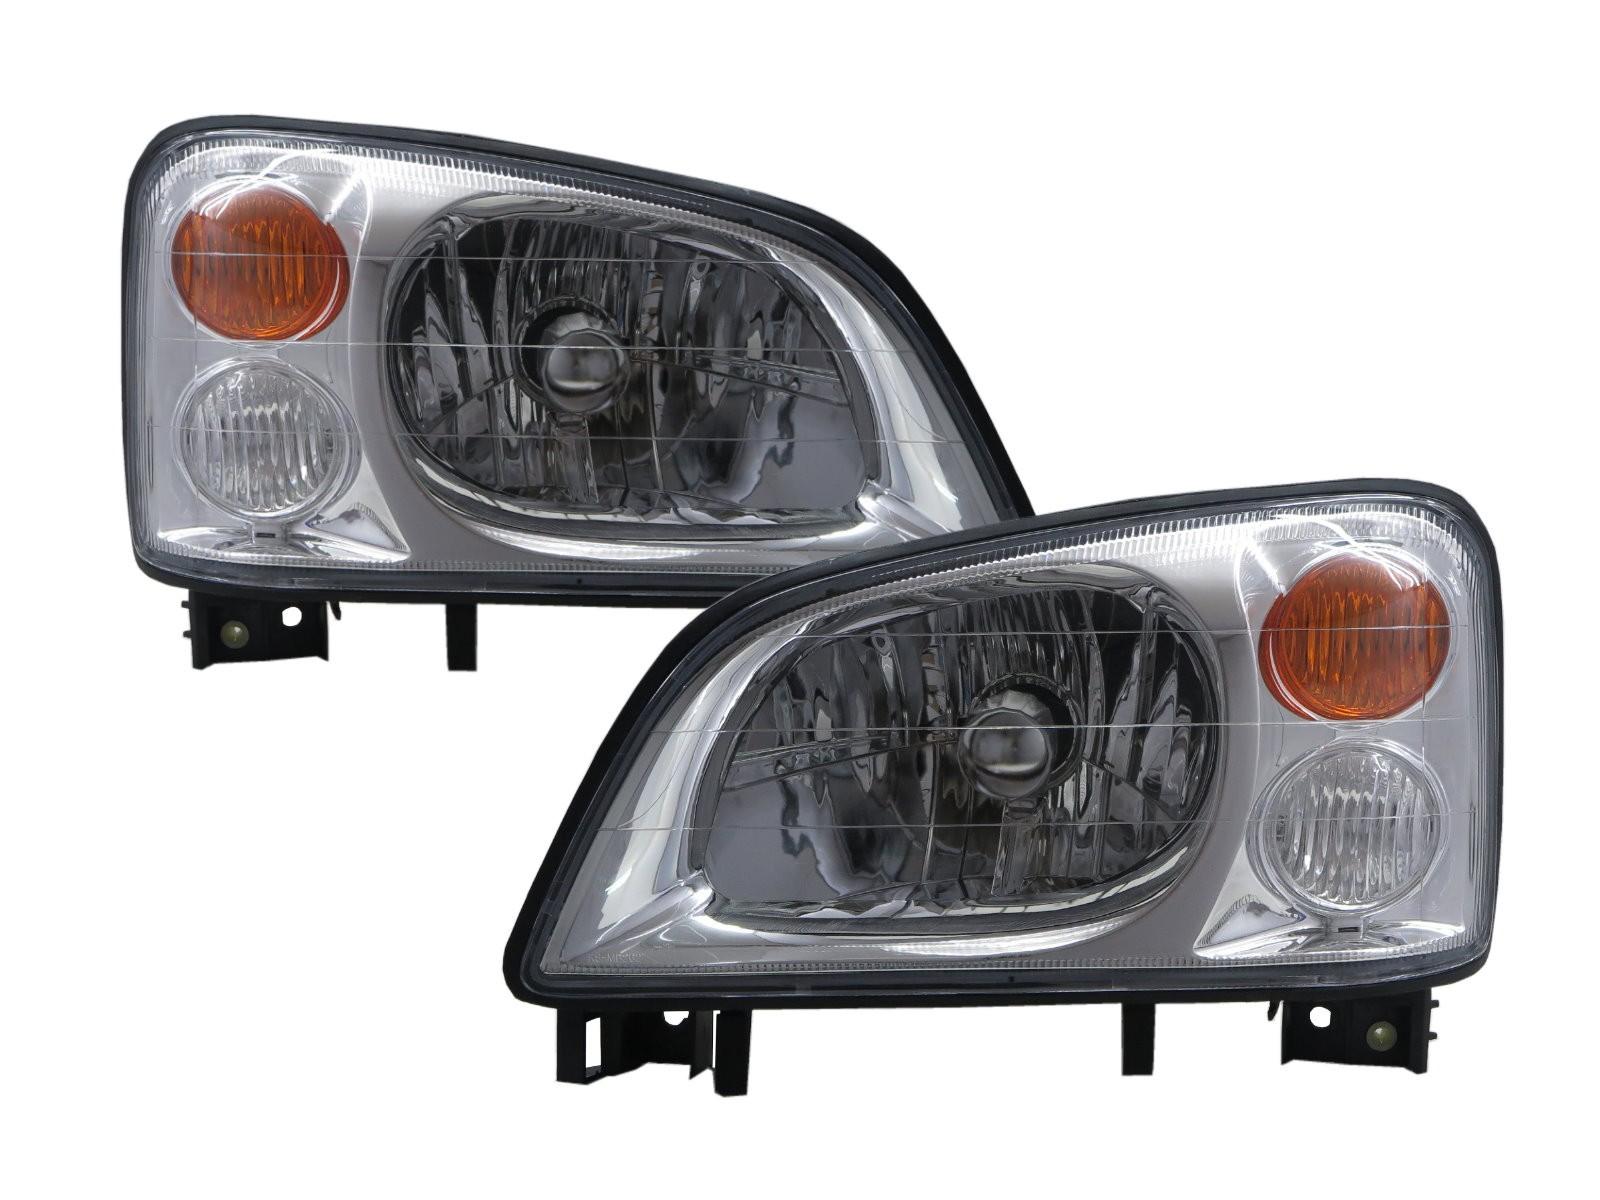 CrazyTheGod Veryca 2000-2009 Truck 2D/4D Clear Headlight Headlamp Chrome for Mitsubishi LHD